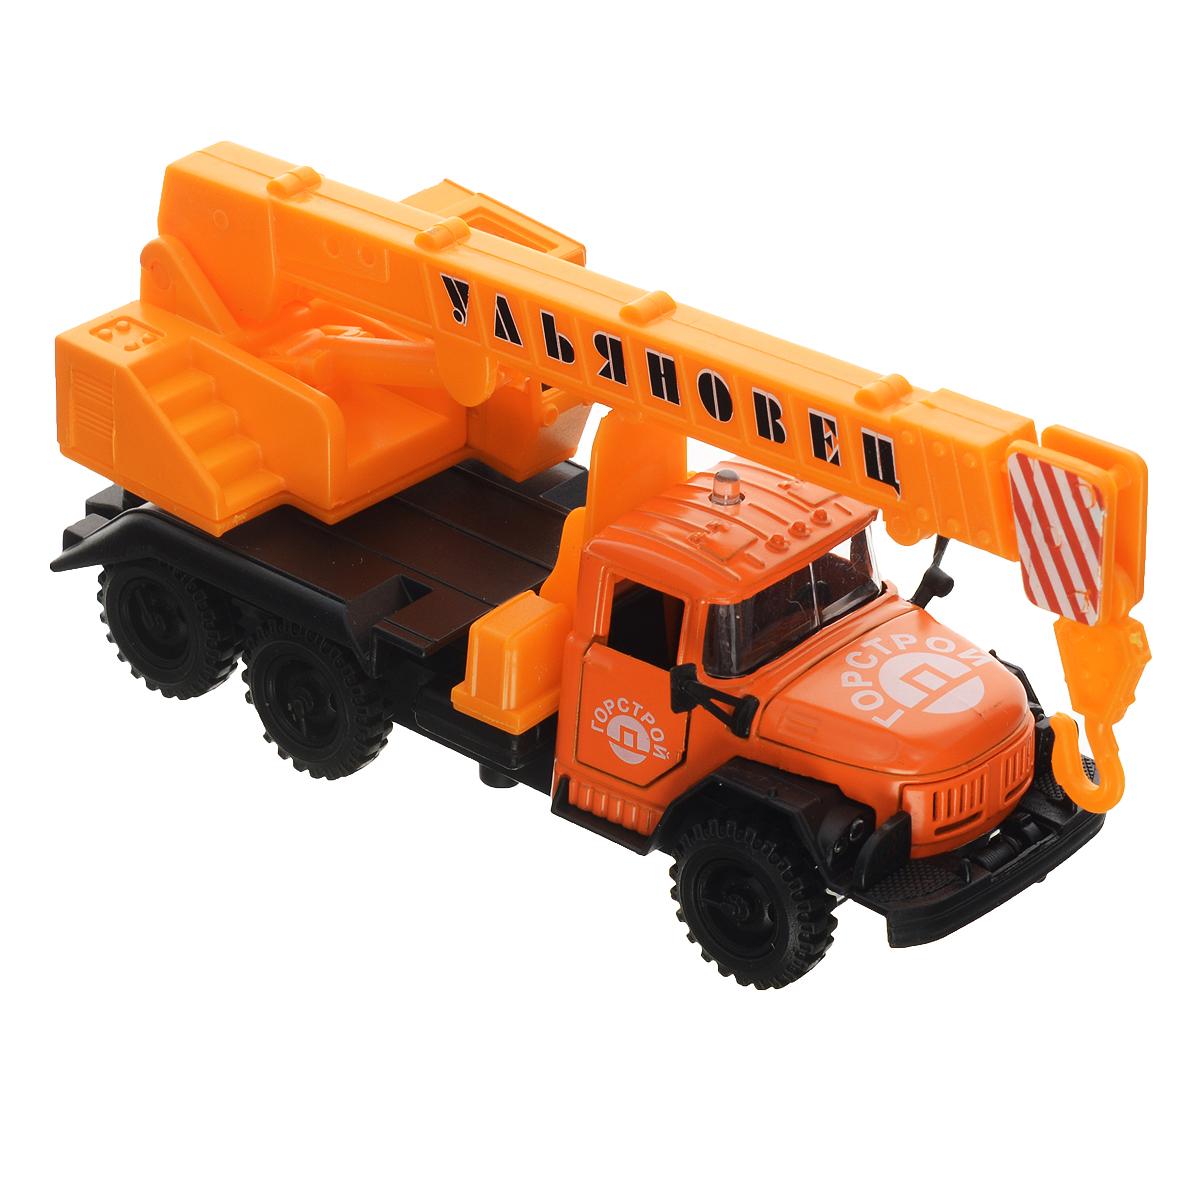 ТехноПарк Автокран ЗИЛ 131 игрушка технопарк зил 130 ct11 309 1